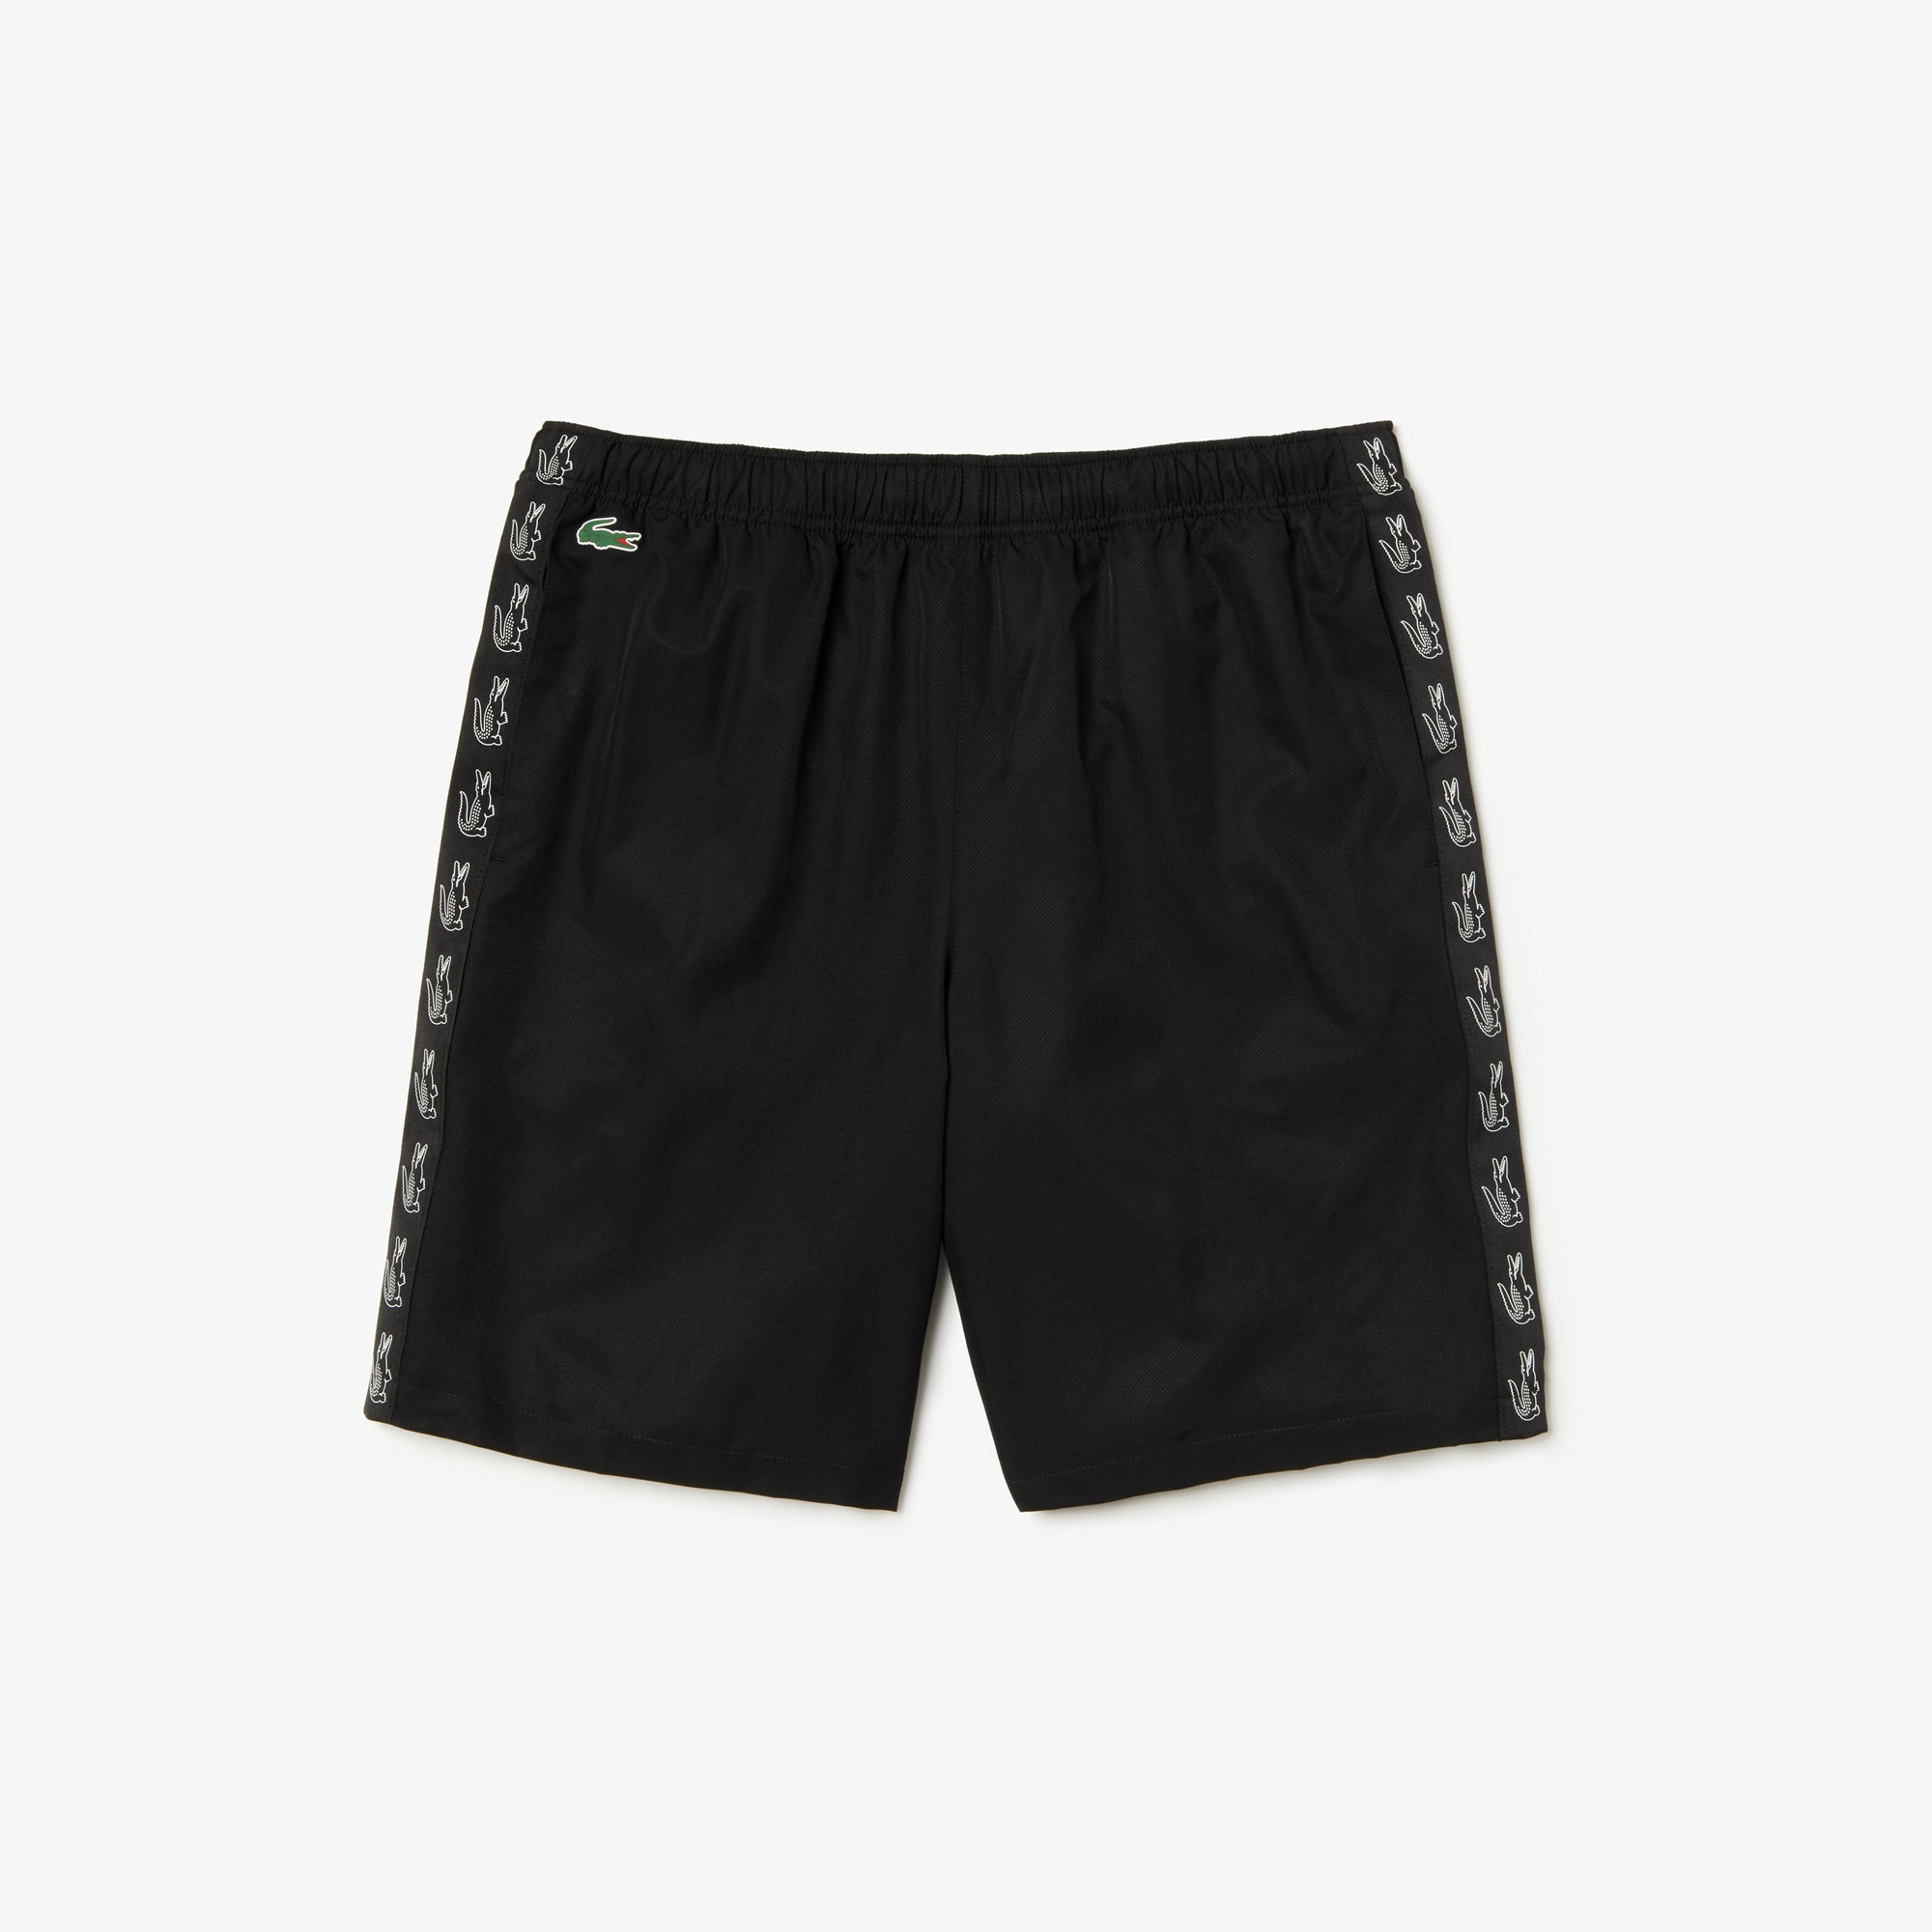 0429f348f4f5 Pantalons   Bermudas Homme